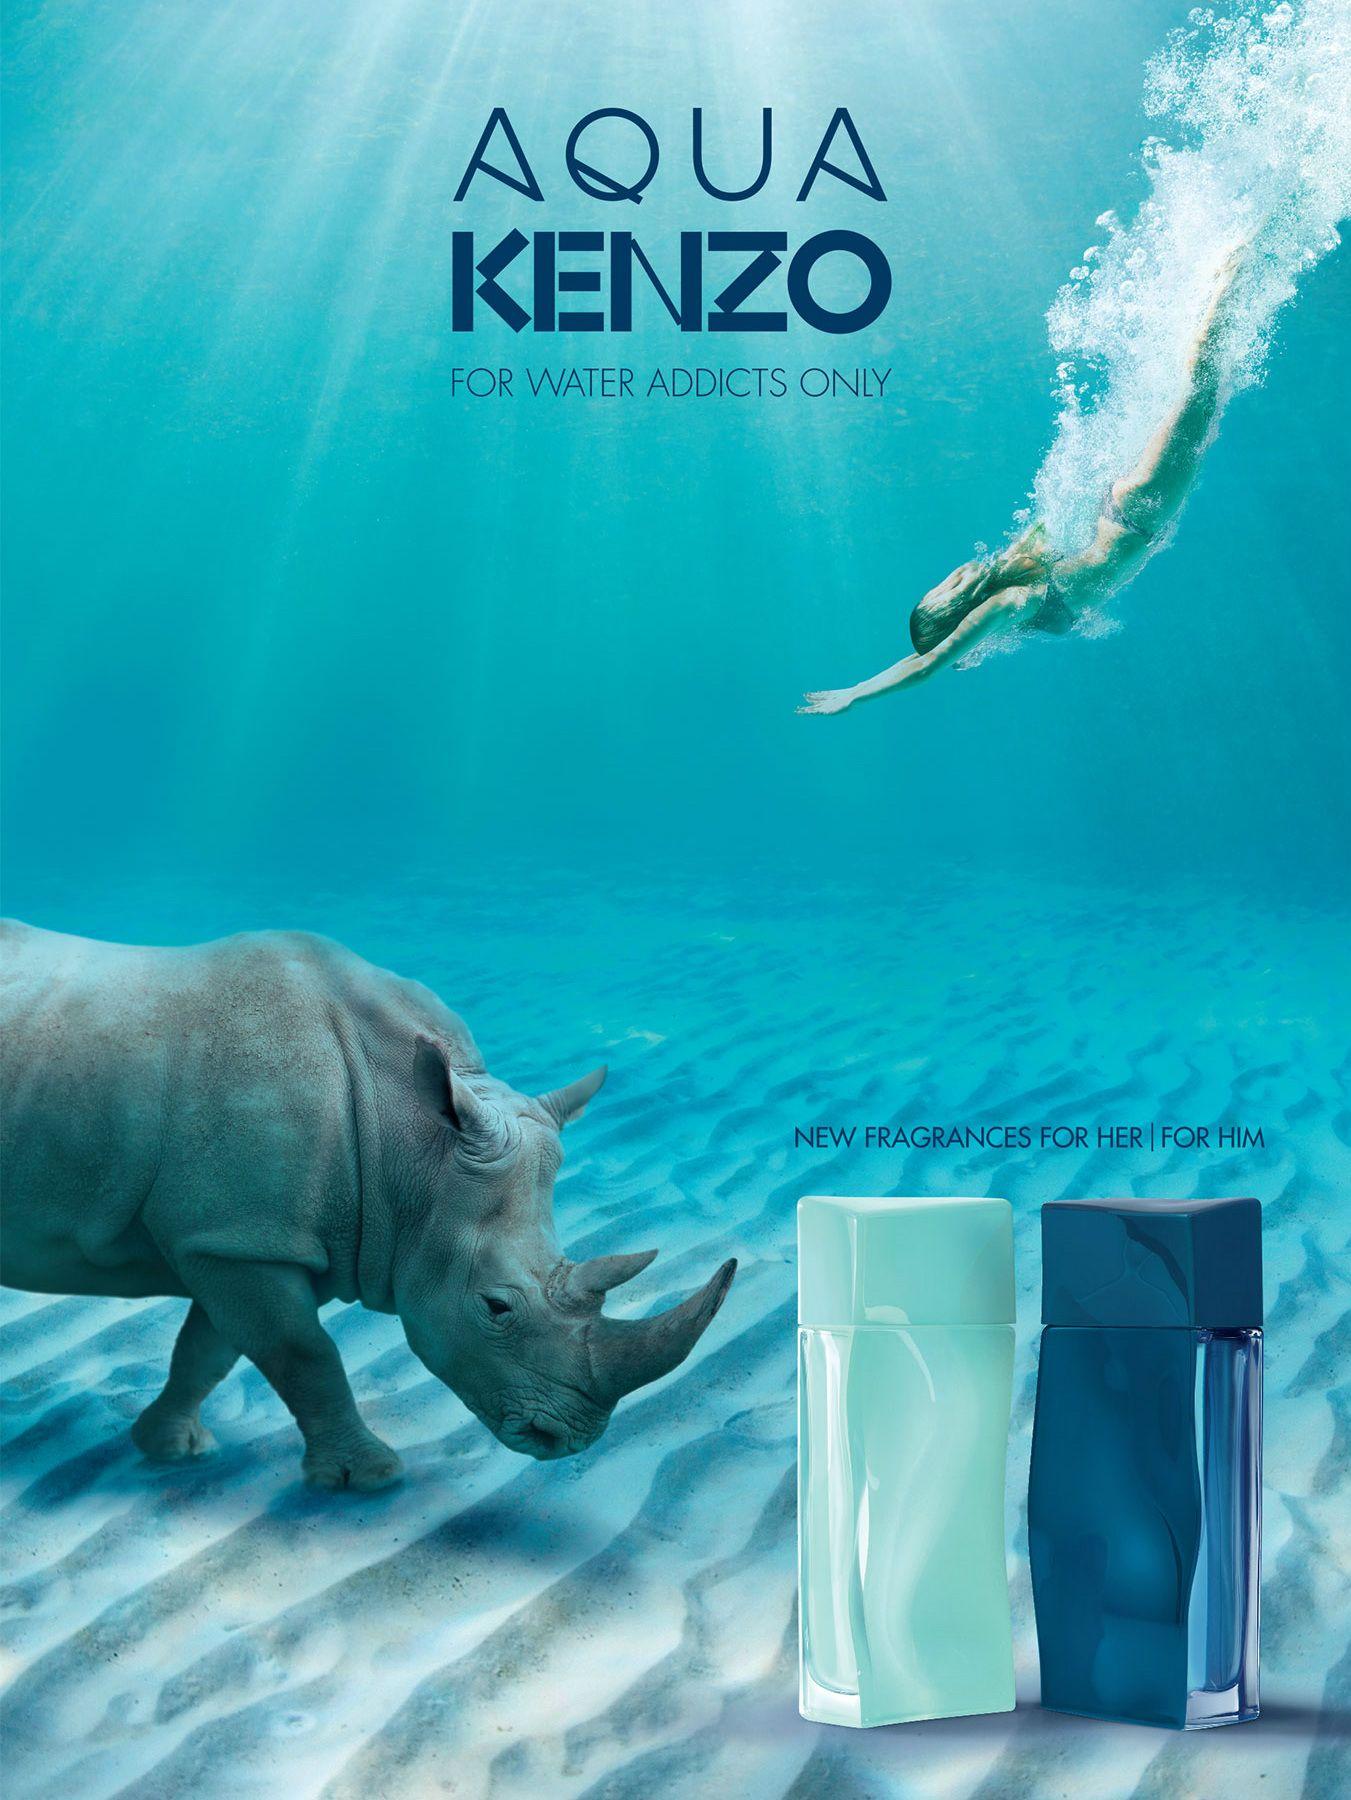 Fragrance Kenzo Duo AquaParfums New – From The TKcFJ1l